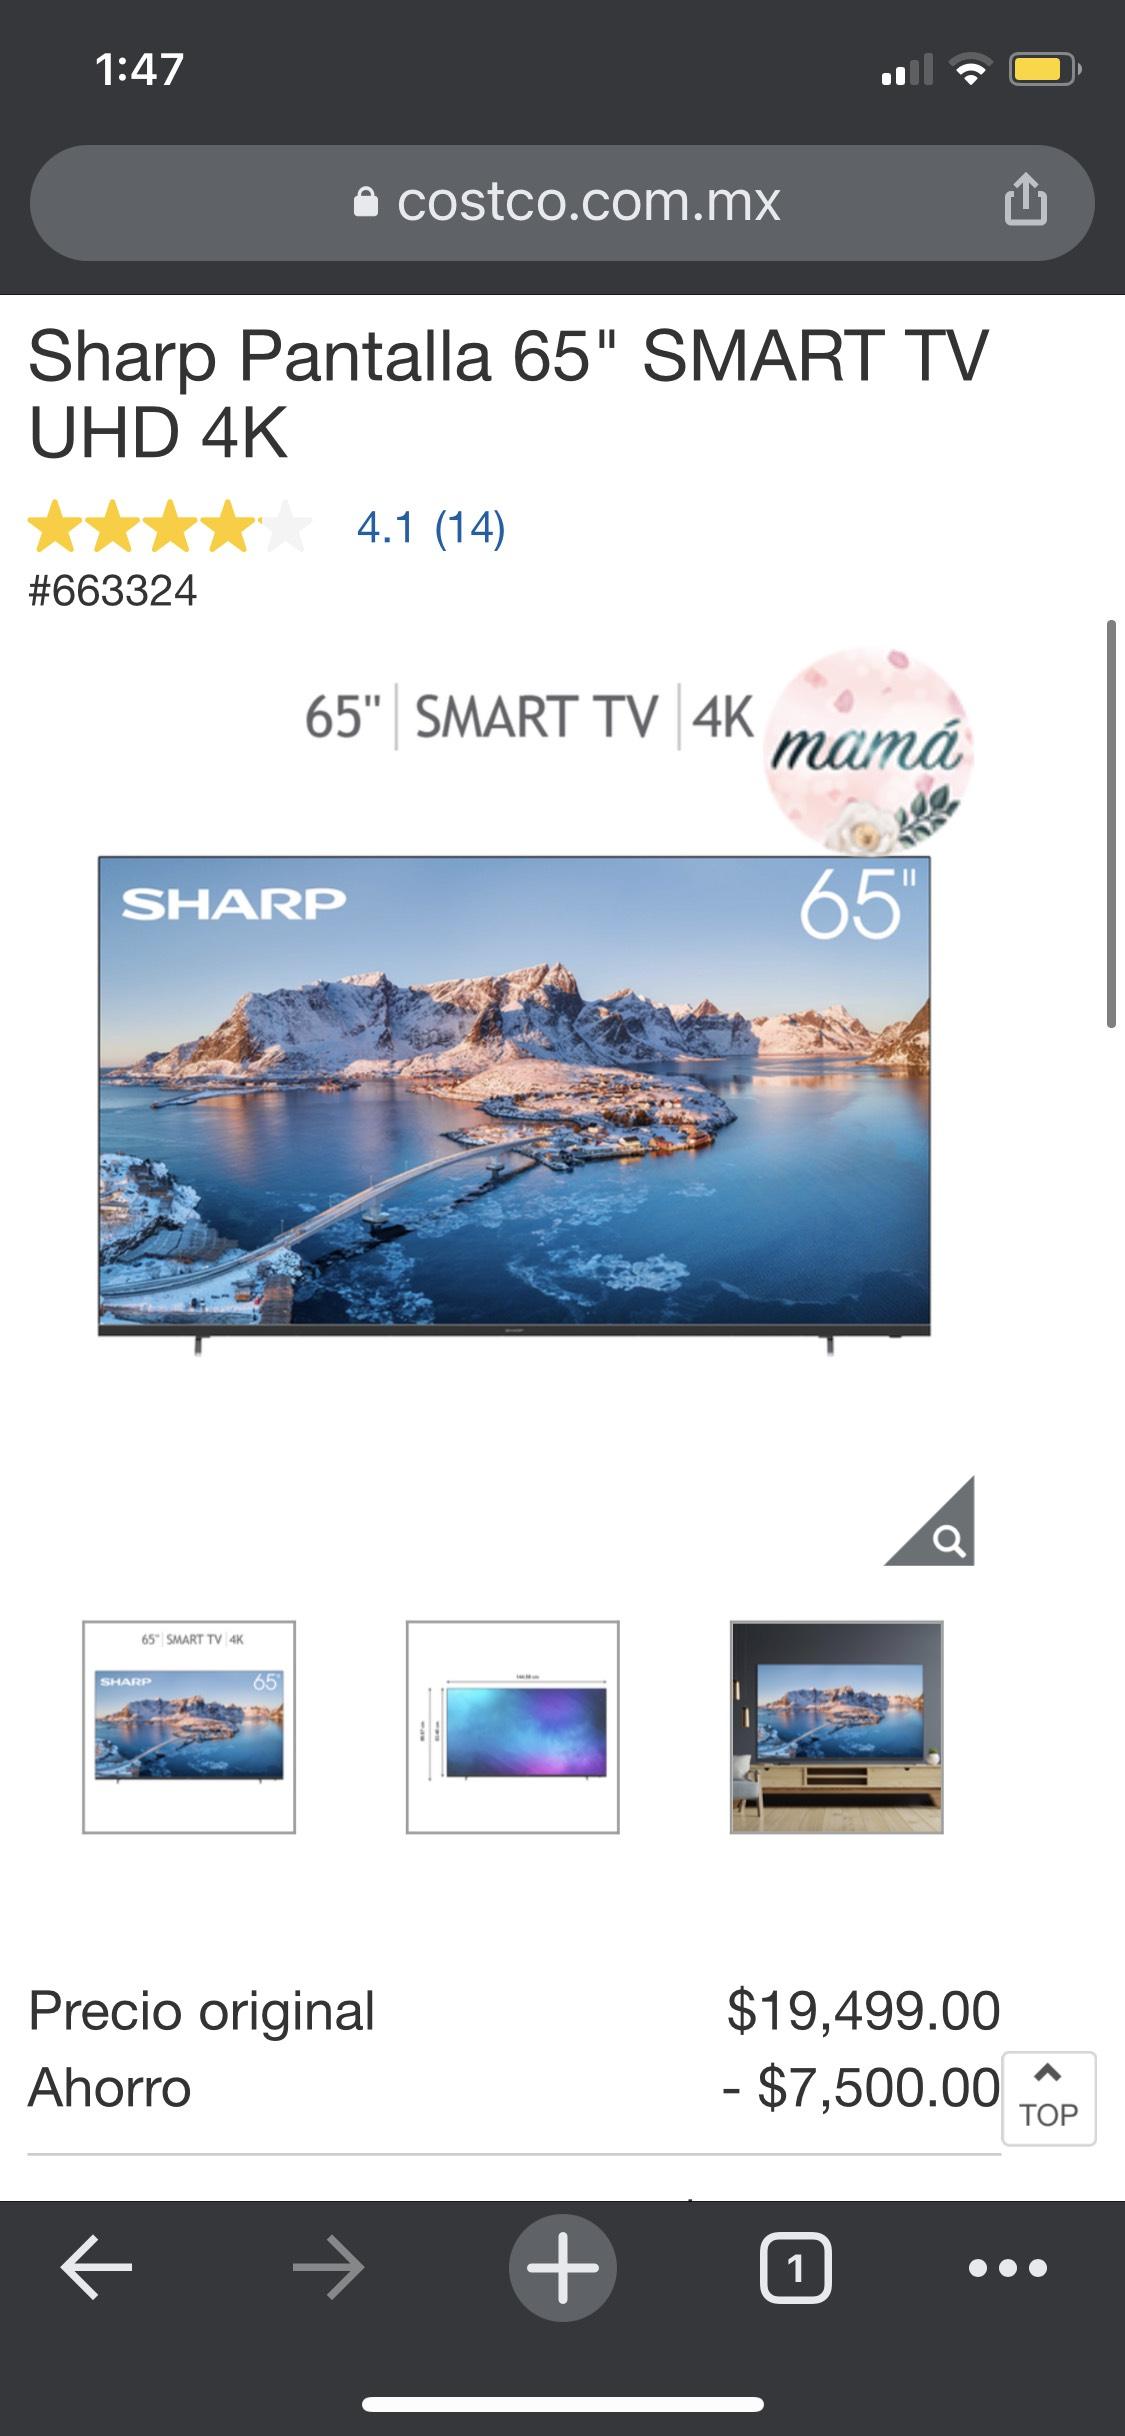 "Costco: Sharp Pantalla 65"" SMART TV UHD 4K"